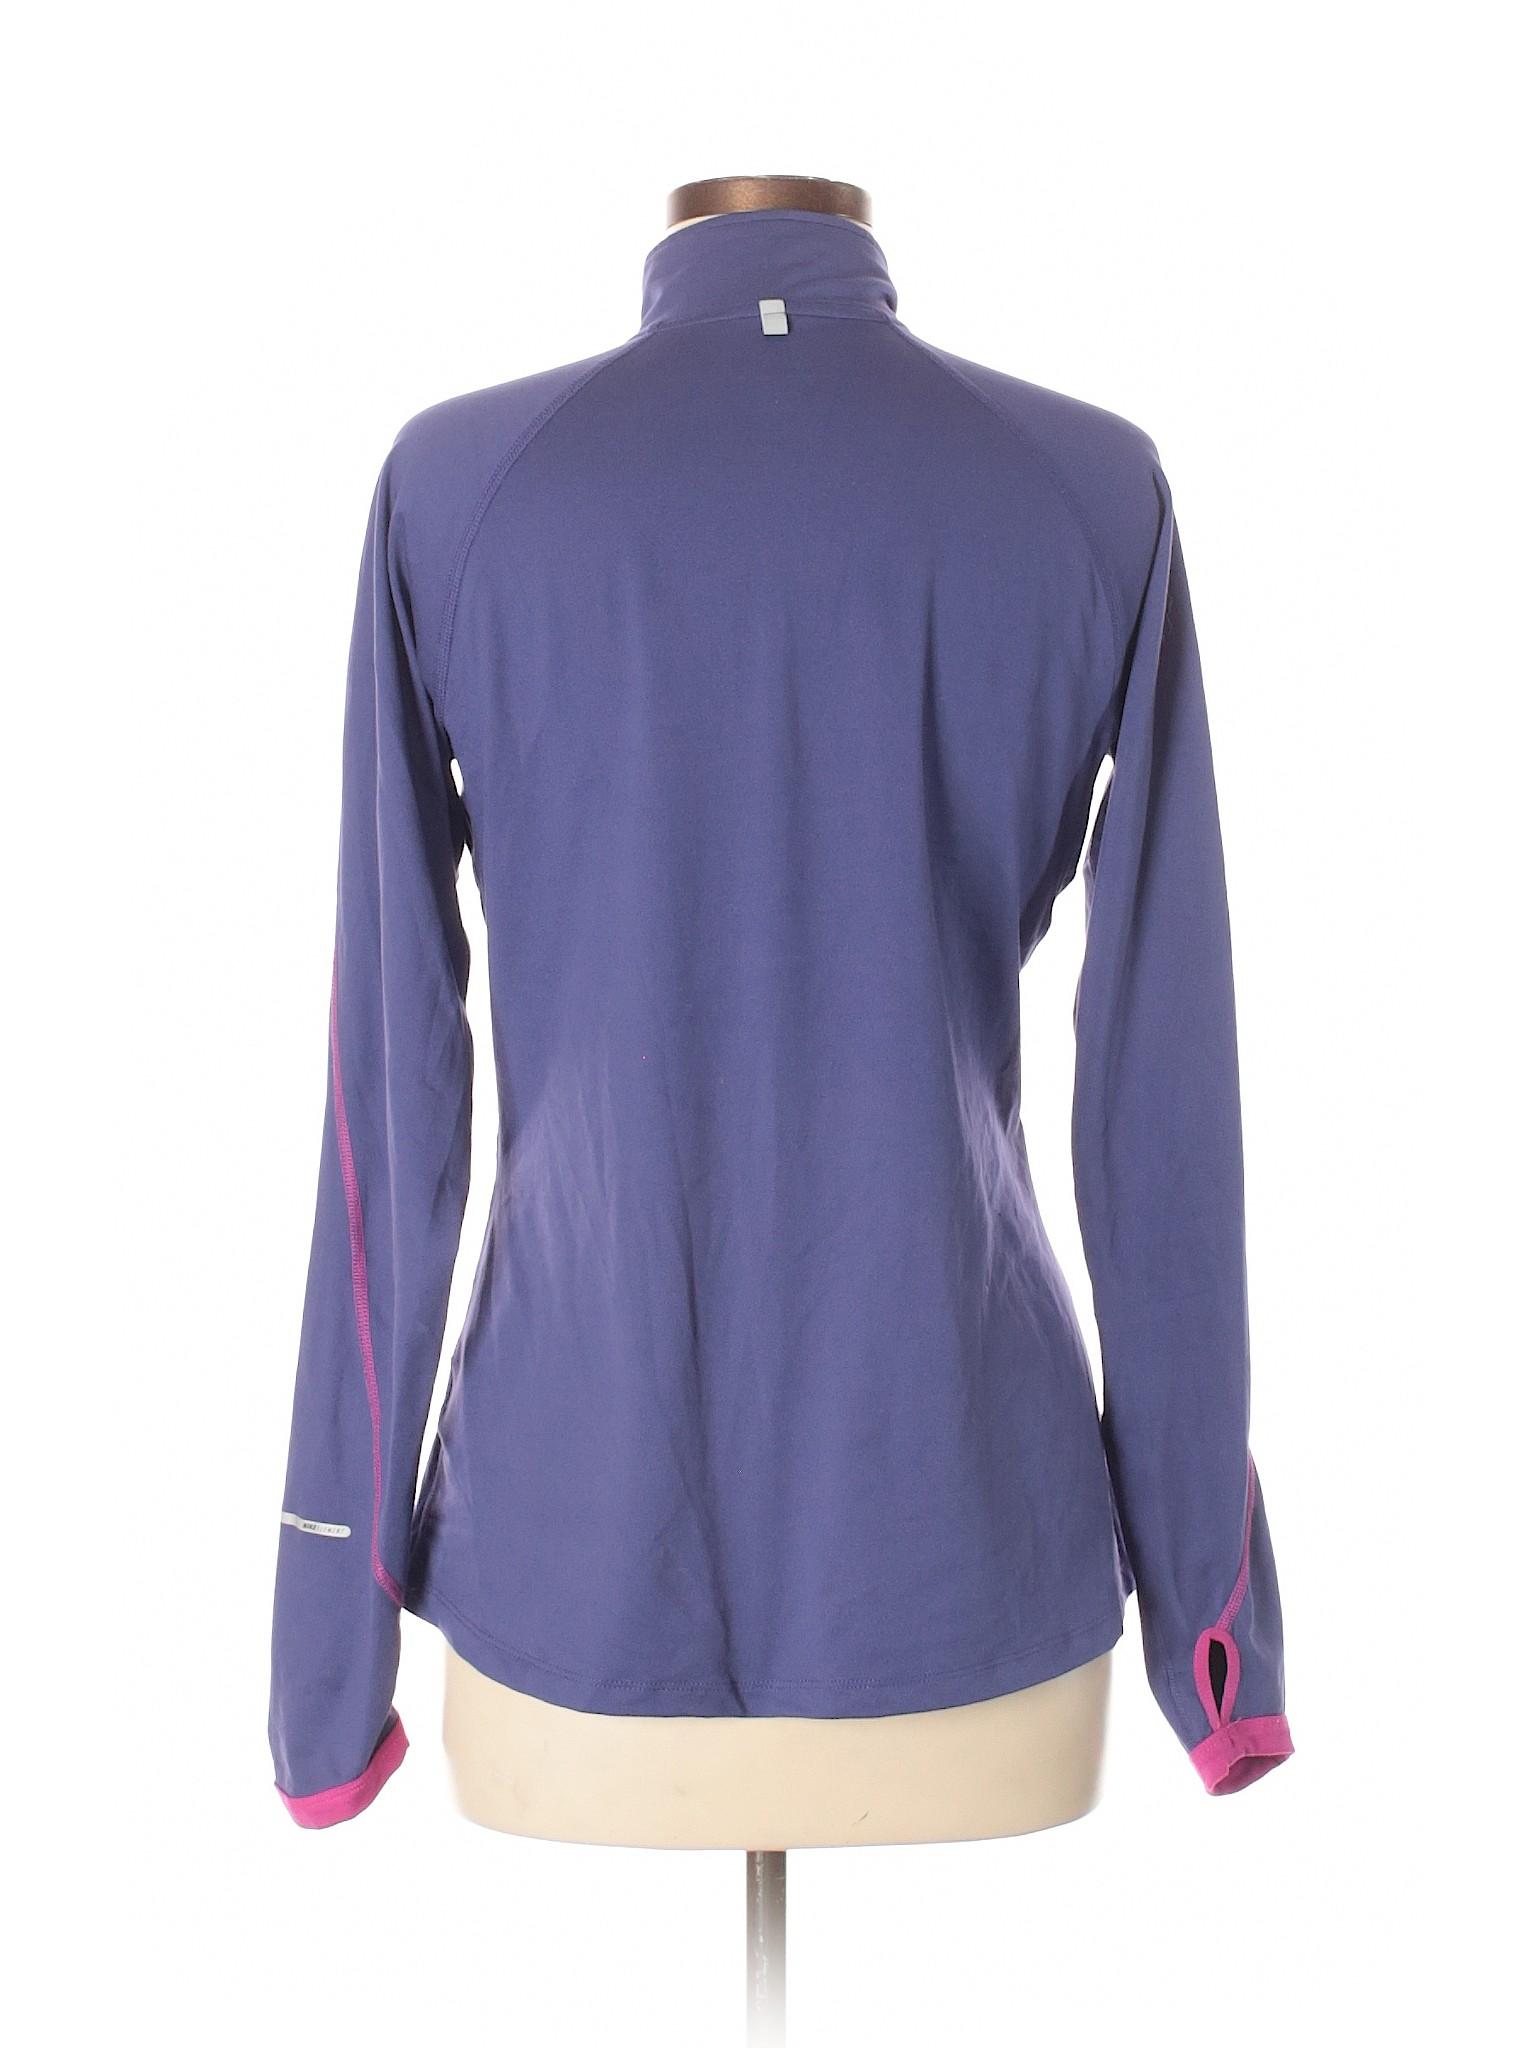 leisure Boutique Jacket Nike Track leisure Nike Boutique Ft5Hgq